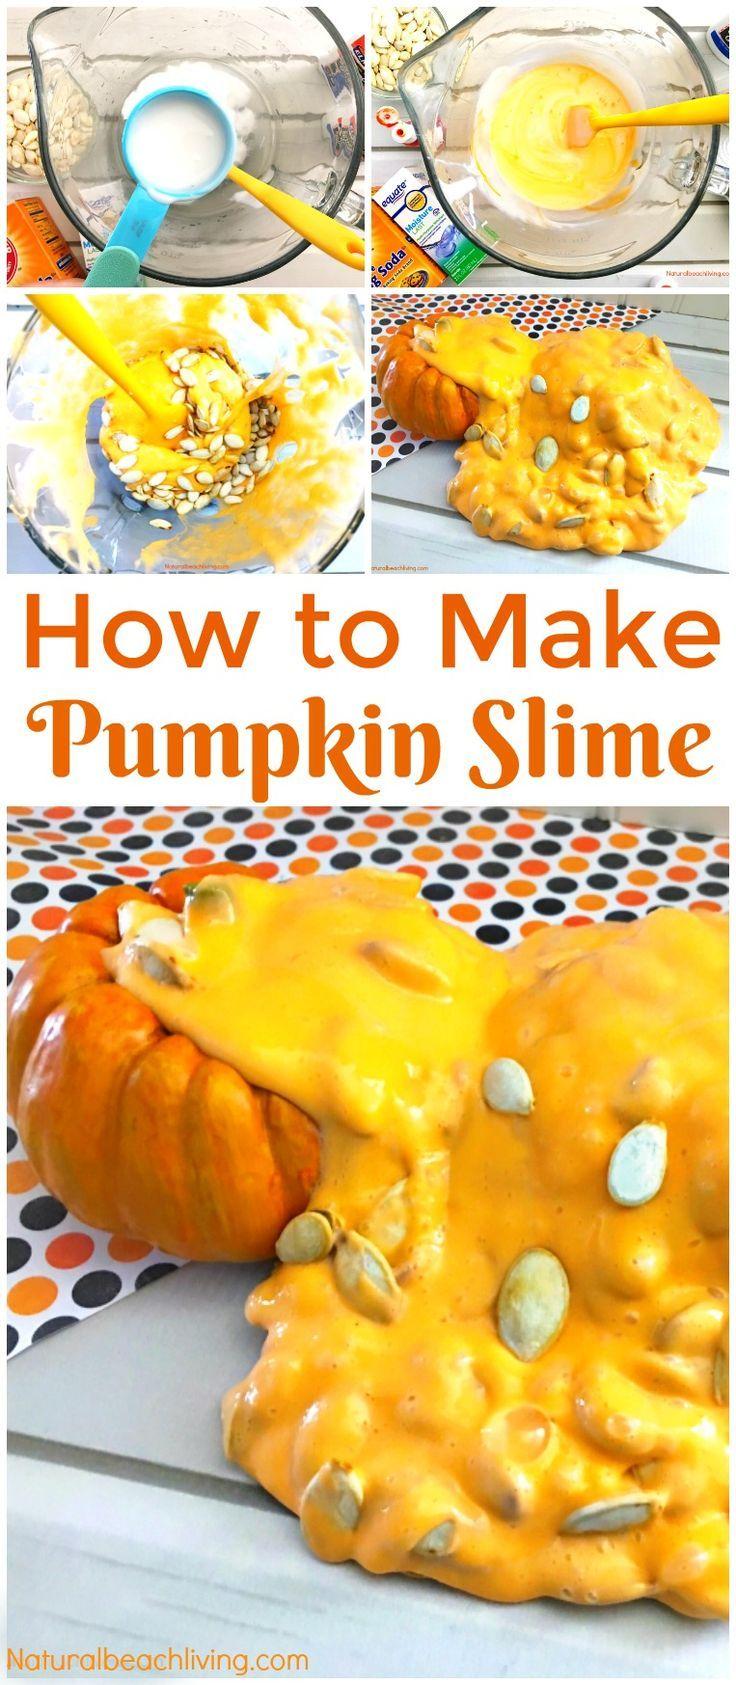 How to Make Halloween Pumpkin Salt Painting with Kids #pumpkincraftspreschool